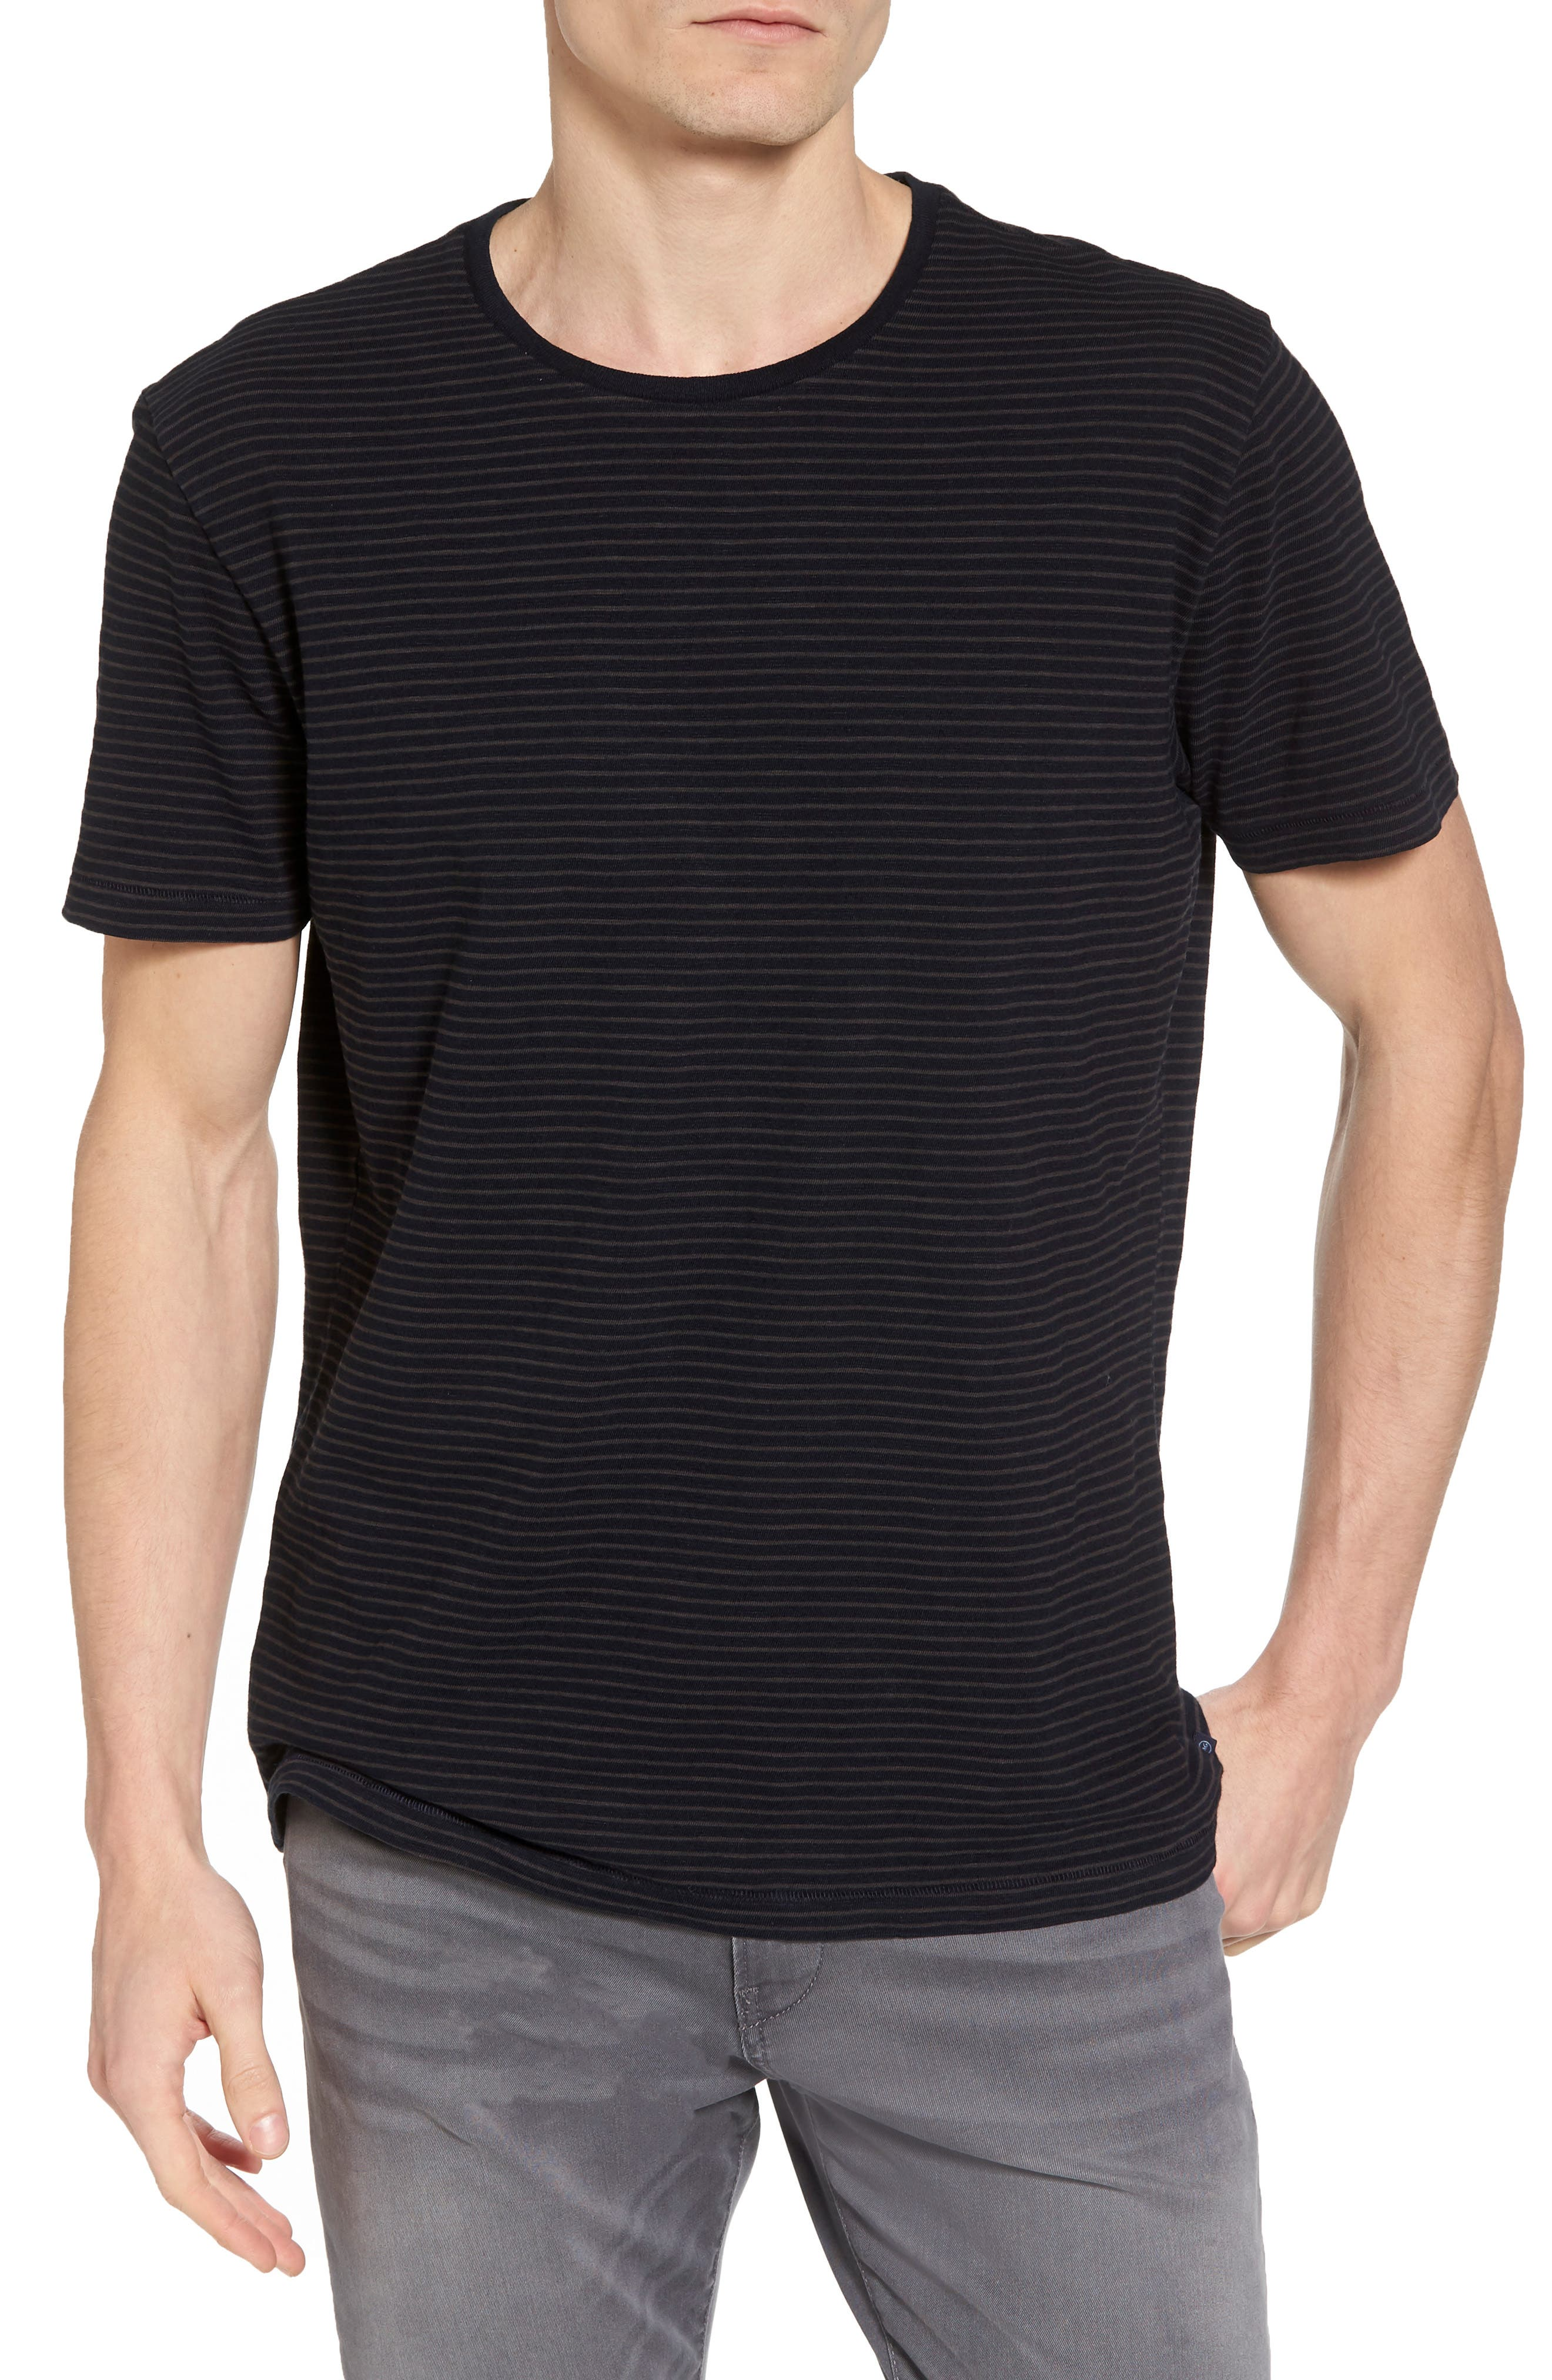 Julian Slim Fit Crewneck Shirt,                             Main thumbnail 2, color,